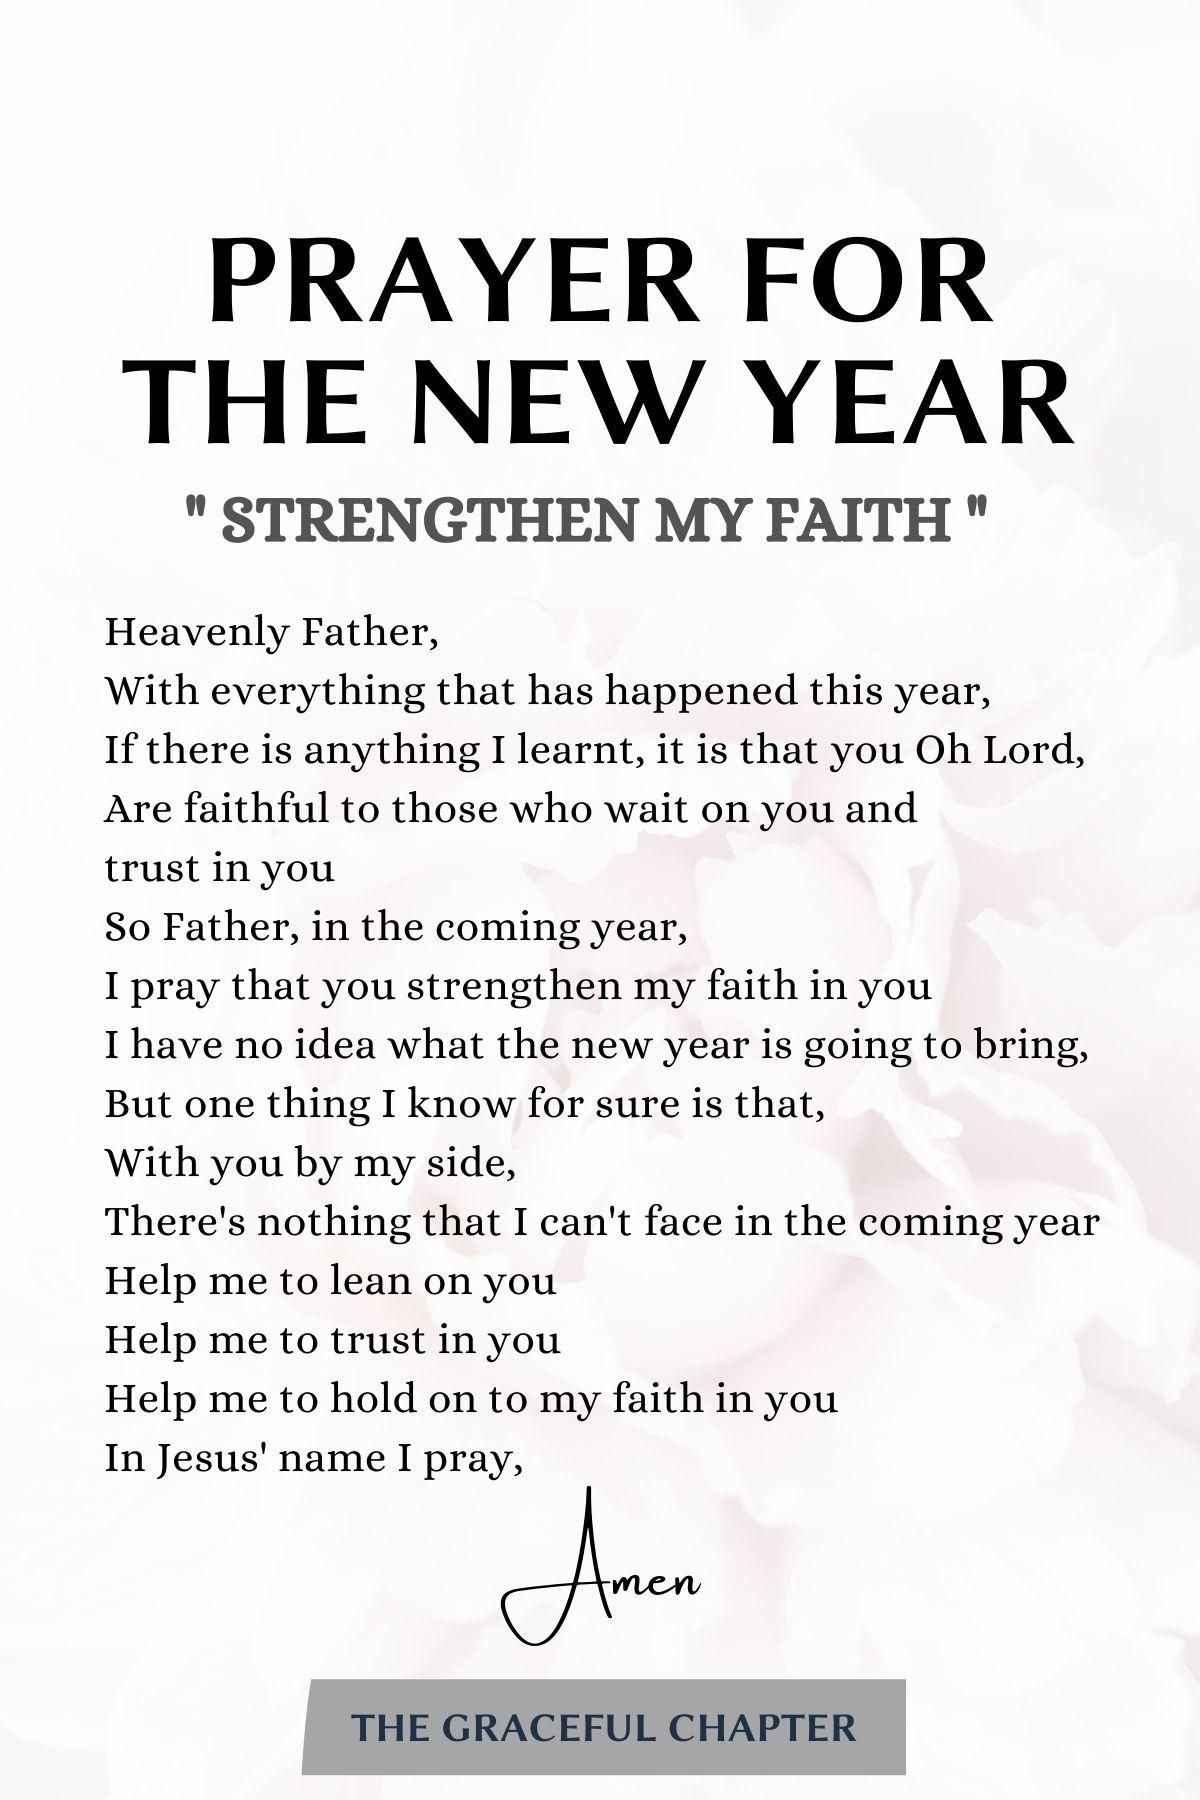 8. Prayer for the new year - Strengthen my faith